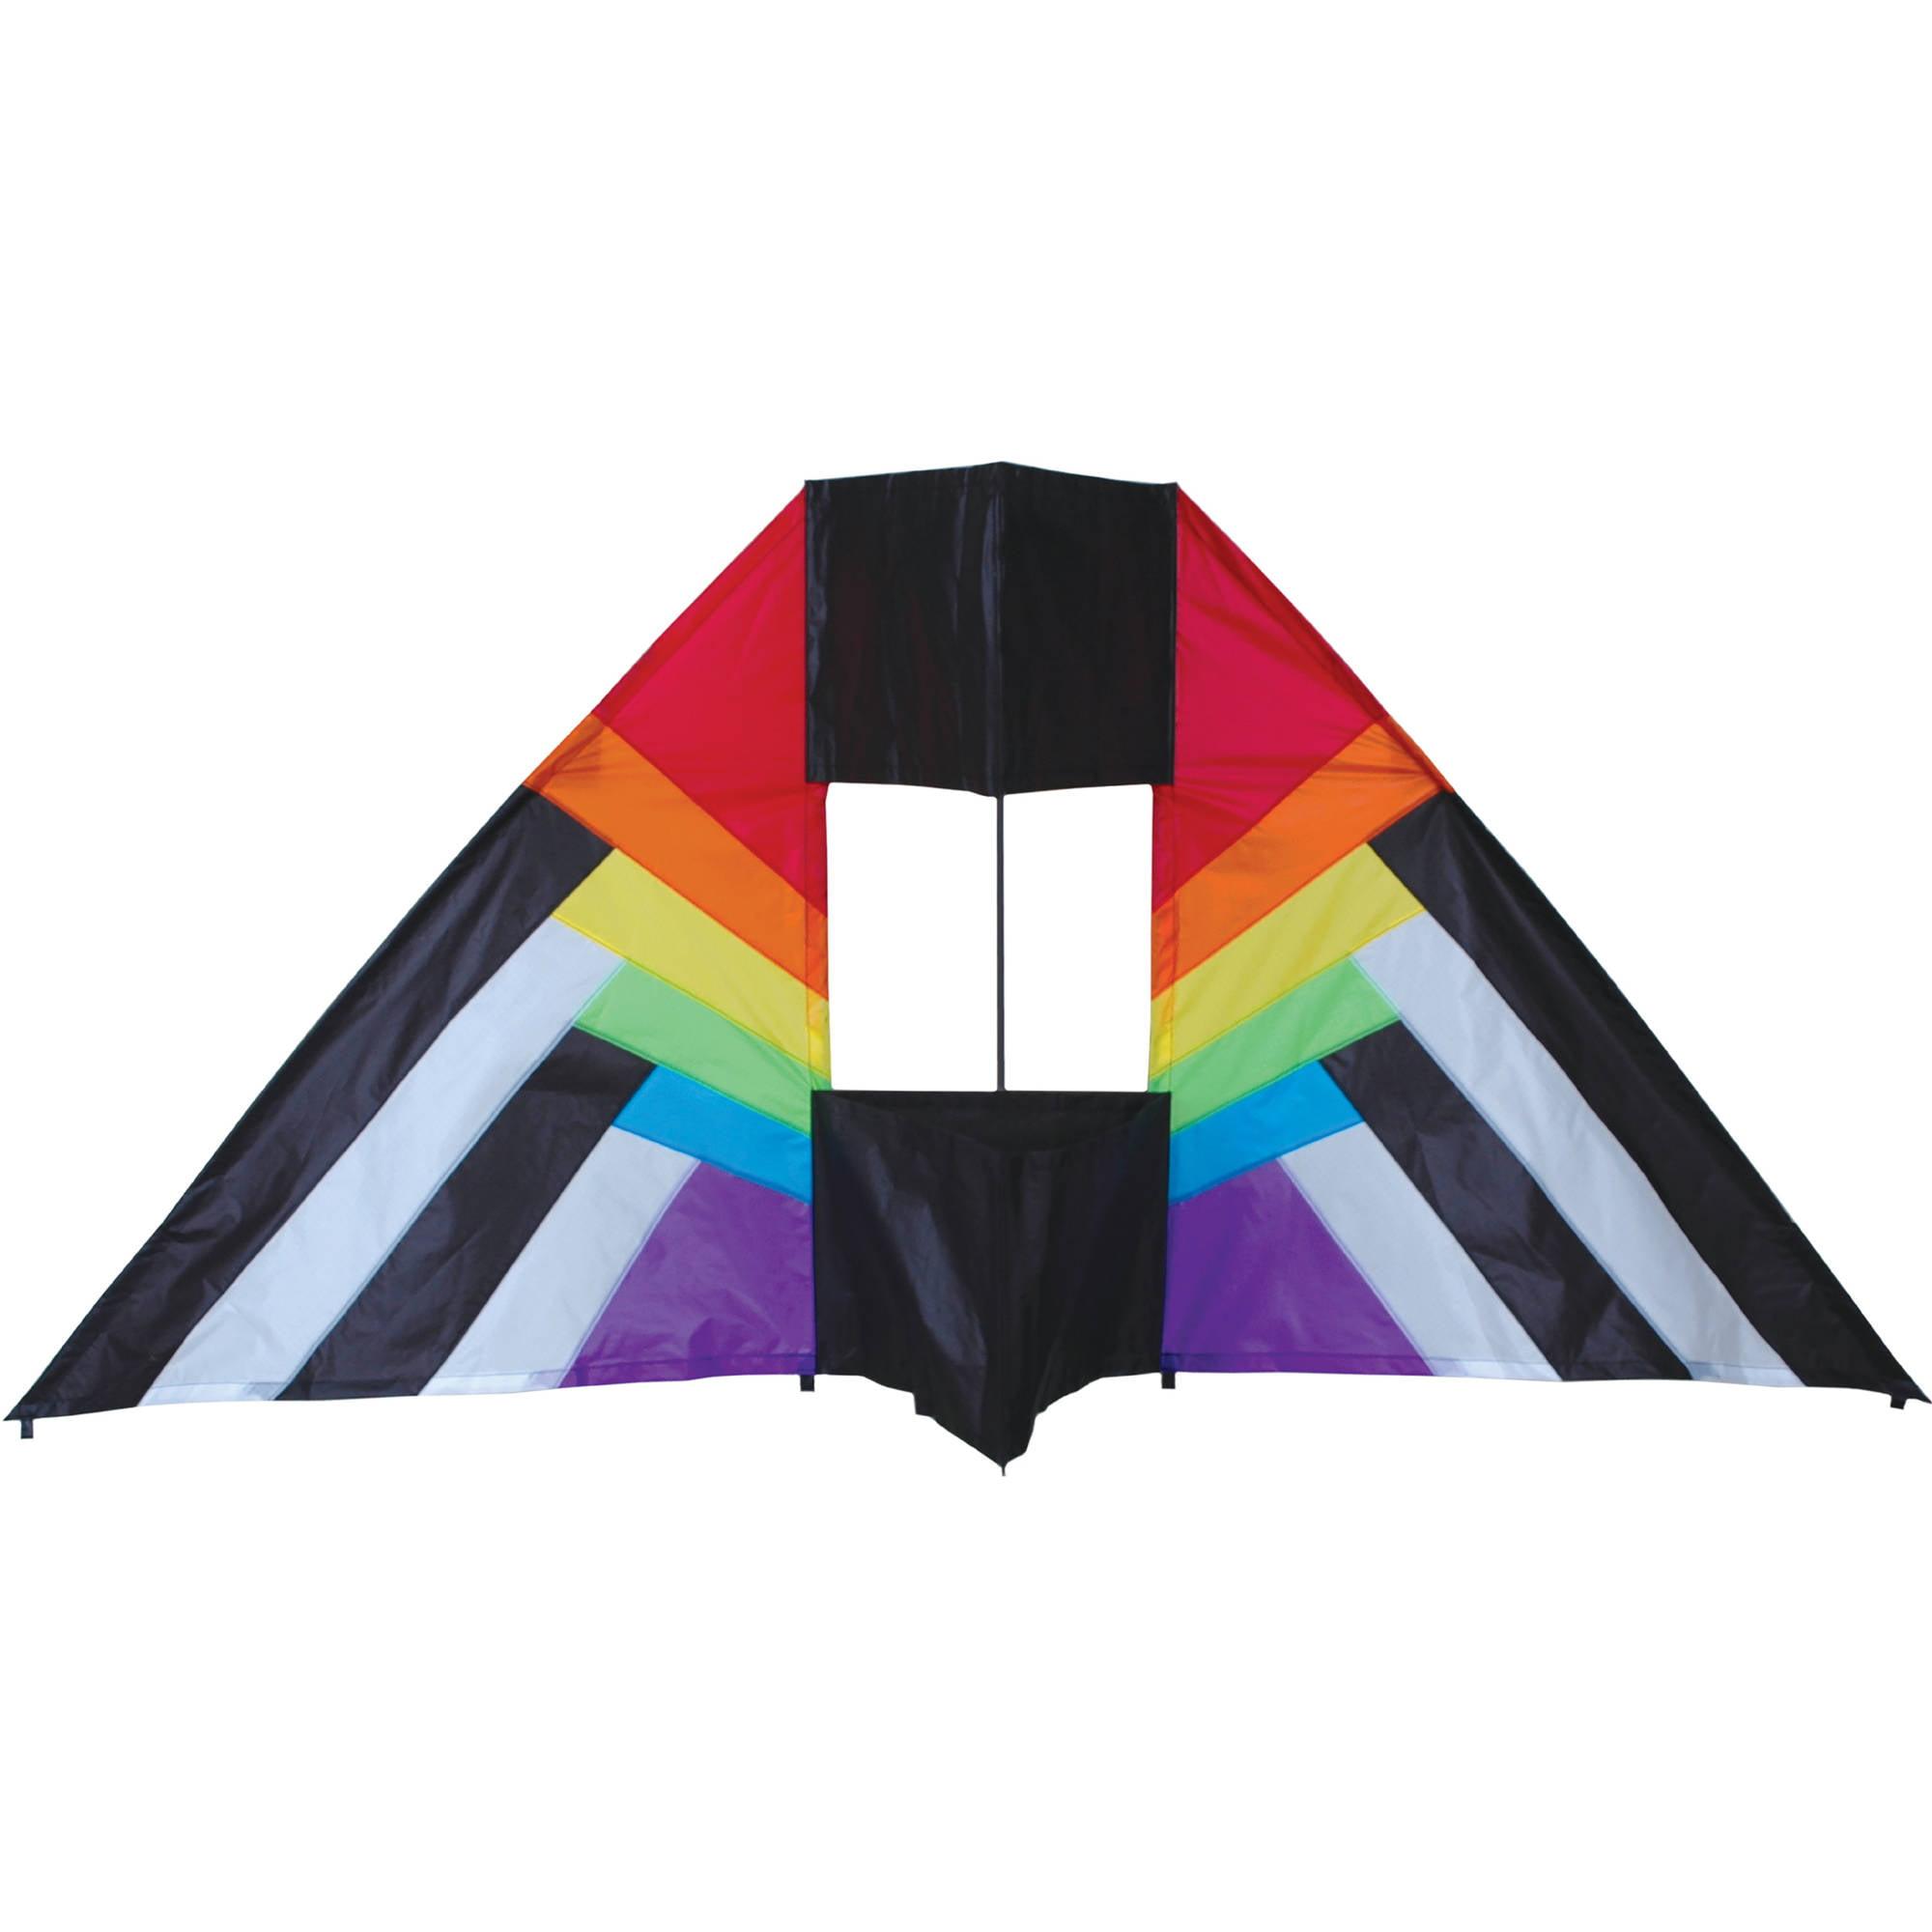 Premier Designs 5.5' Box Delta Kite, RB Spectrum by Premier Kite